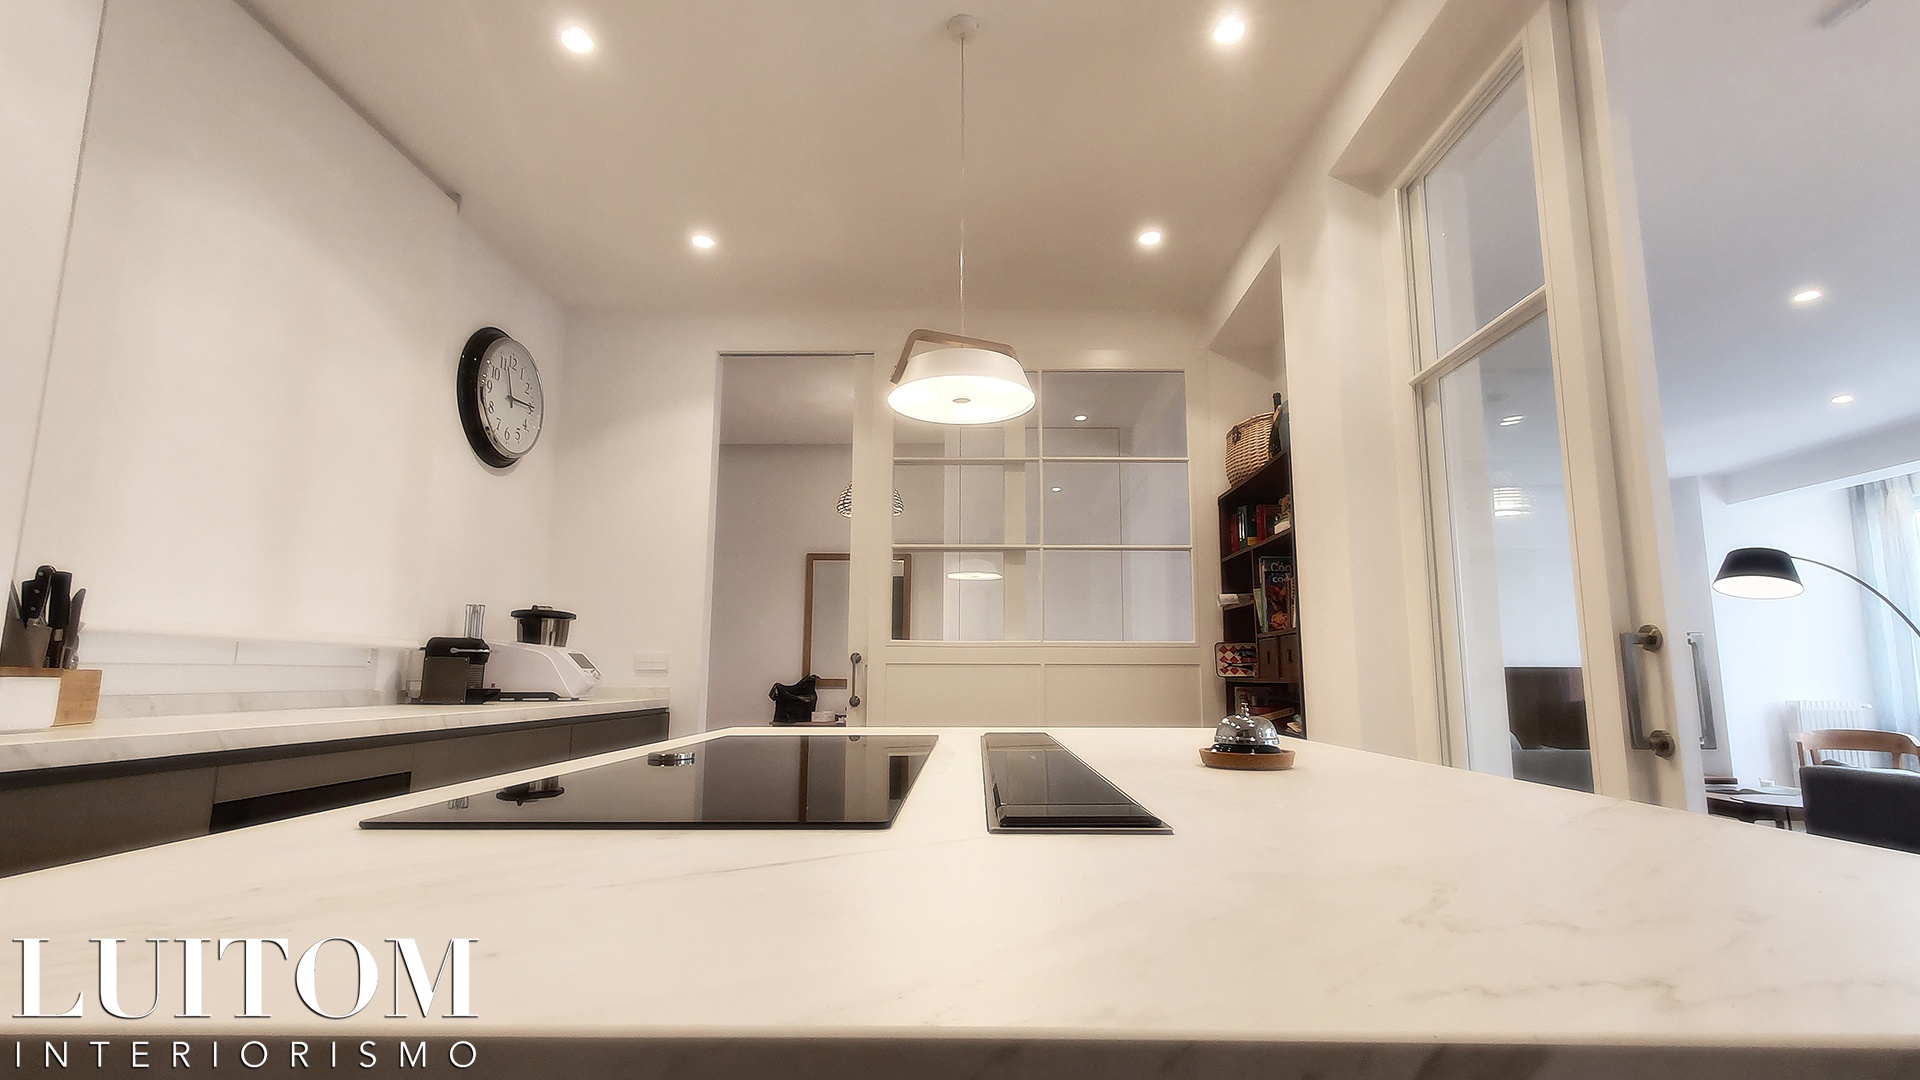 cristaleras-cocinas-pared-cristal-separacion-cocina-salon-cristalera-metalica-madera-blanca-negra-09